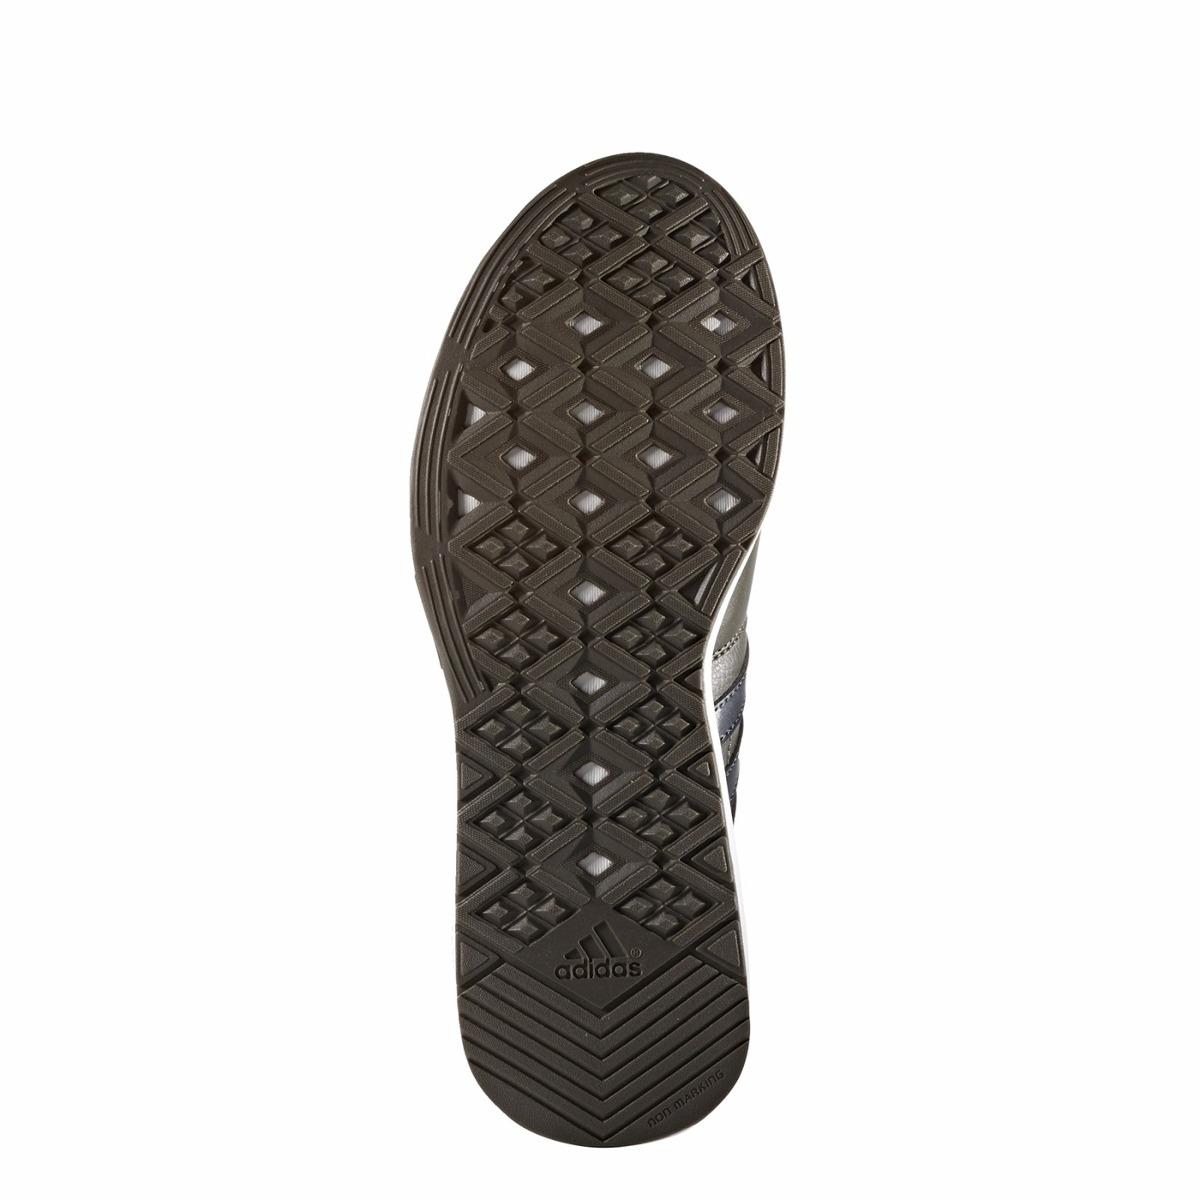 innovative design 77bee 147e6 zapatillas adidas training essential star .2 gris. Cargando zoom.